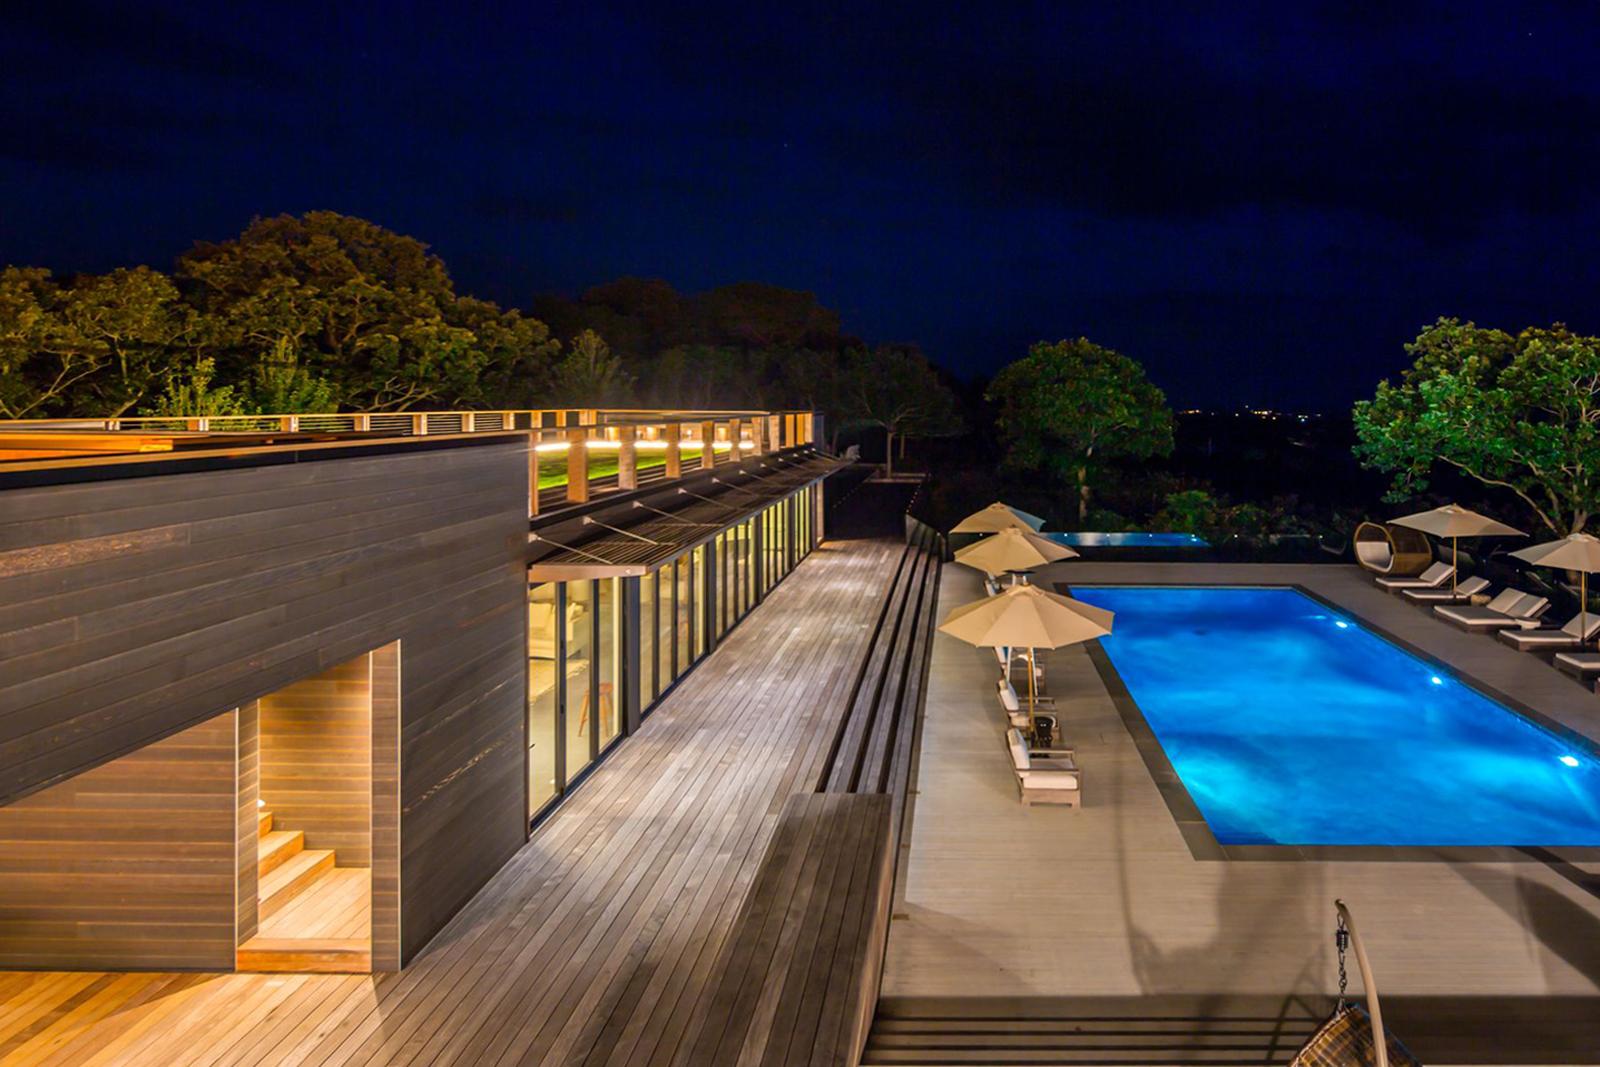 17-res4-resolution-4-architecture-modern-modular-house-prefab-amagansett-addition-exterior-lounge-pool-night.jpg